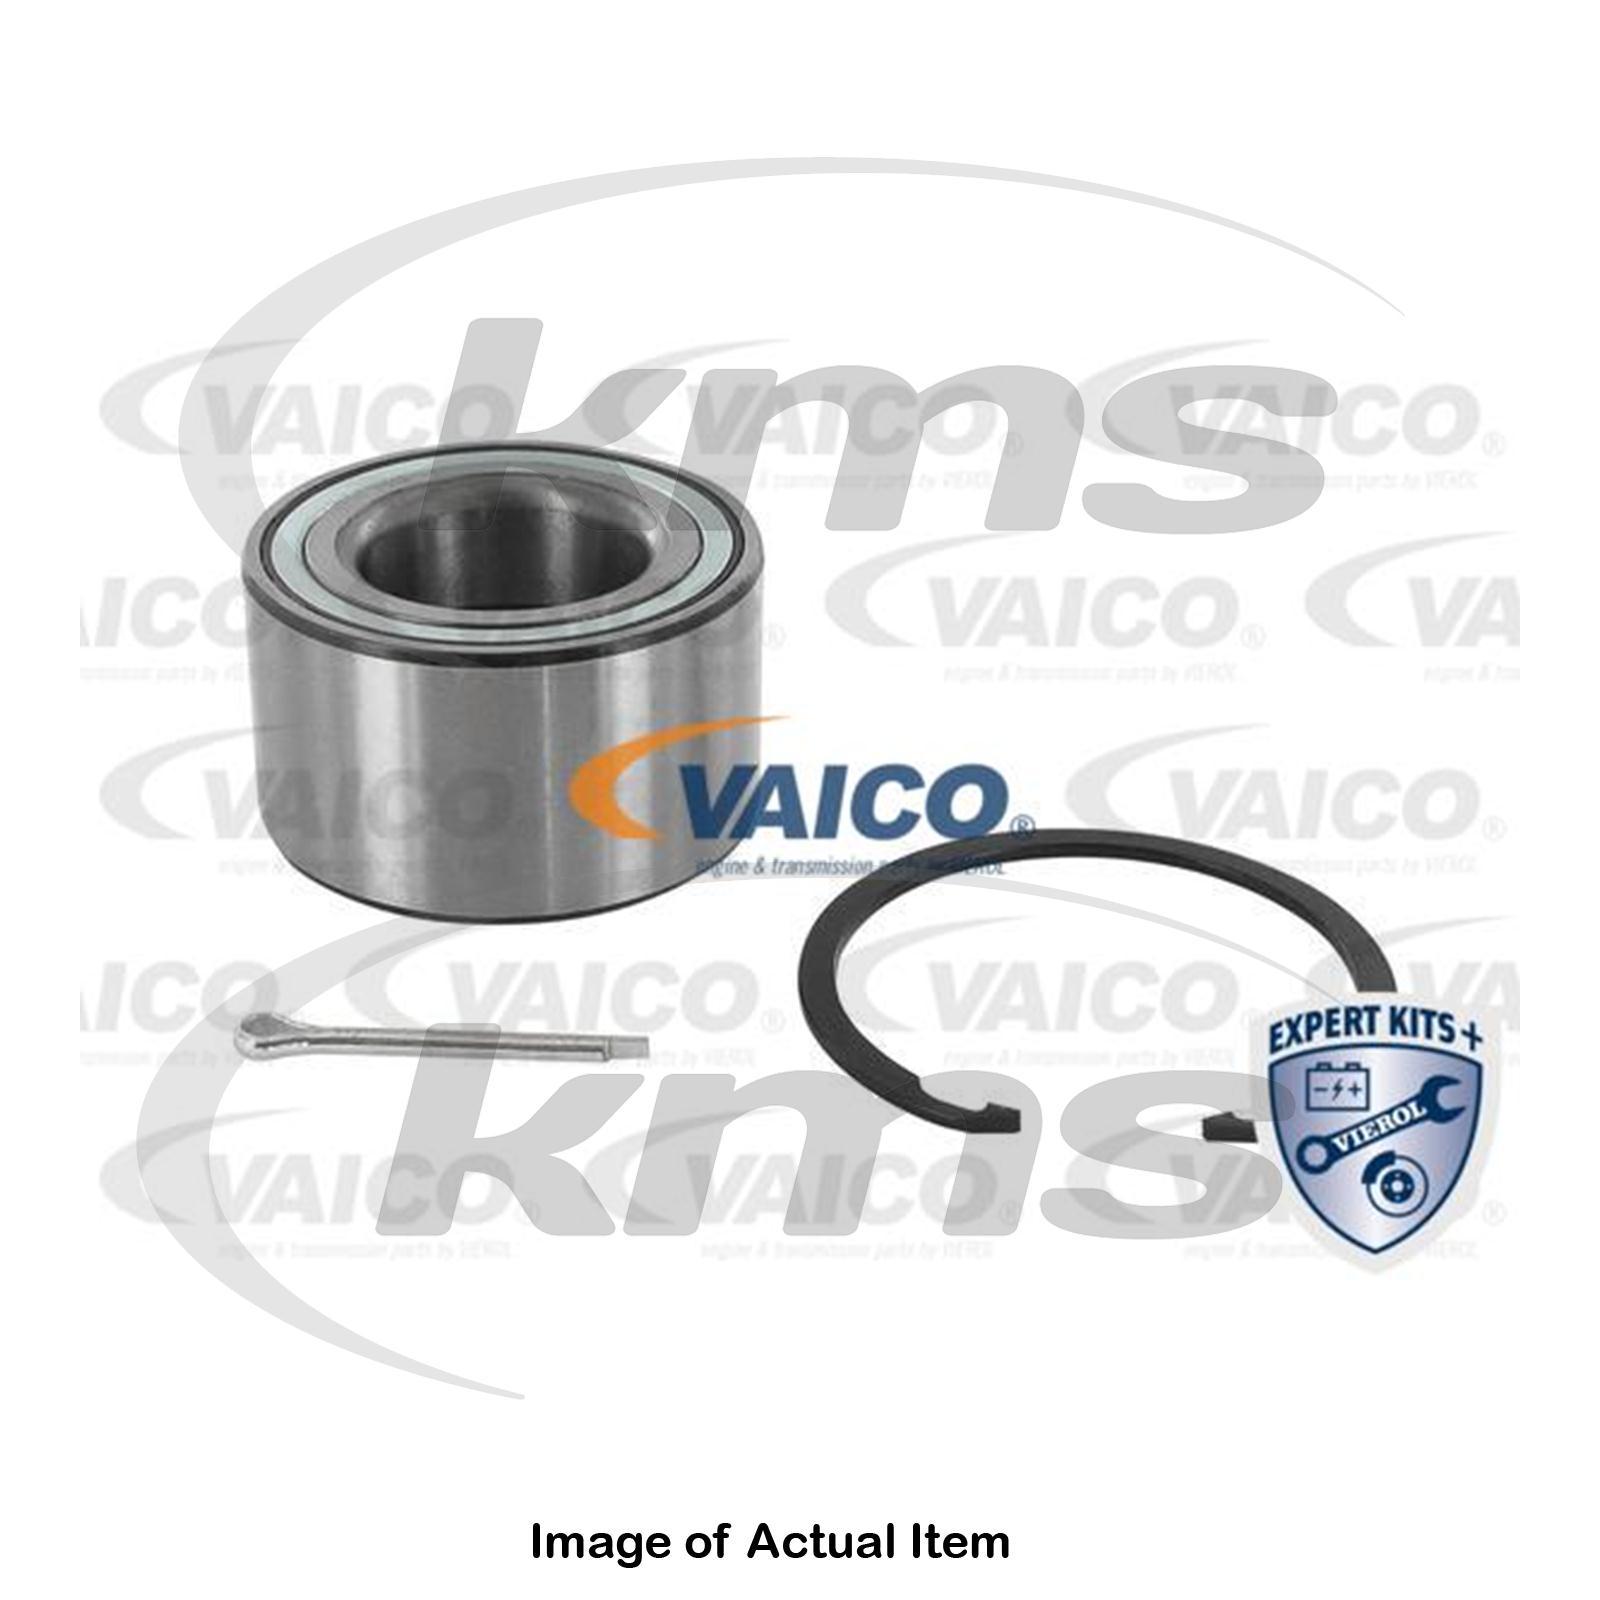 New VAI Wheel Bearing Kit V70-0135 Top German Quality